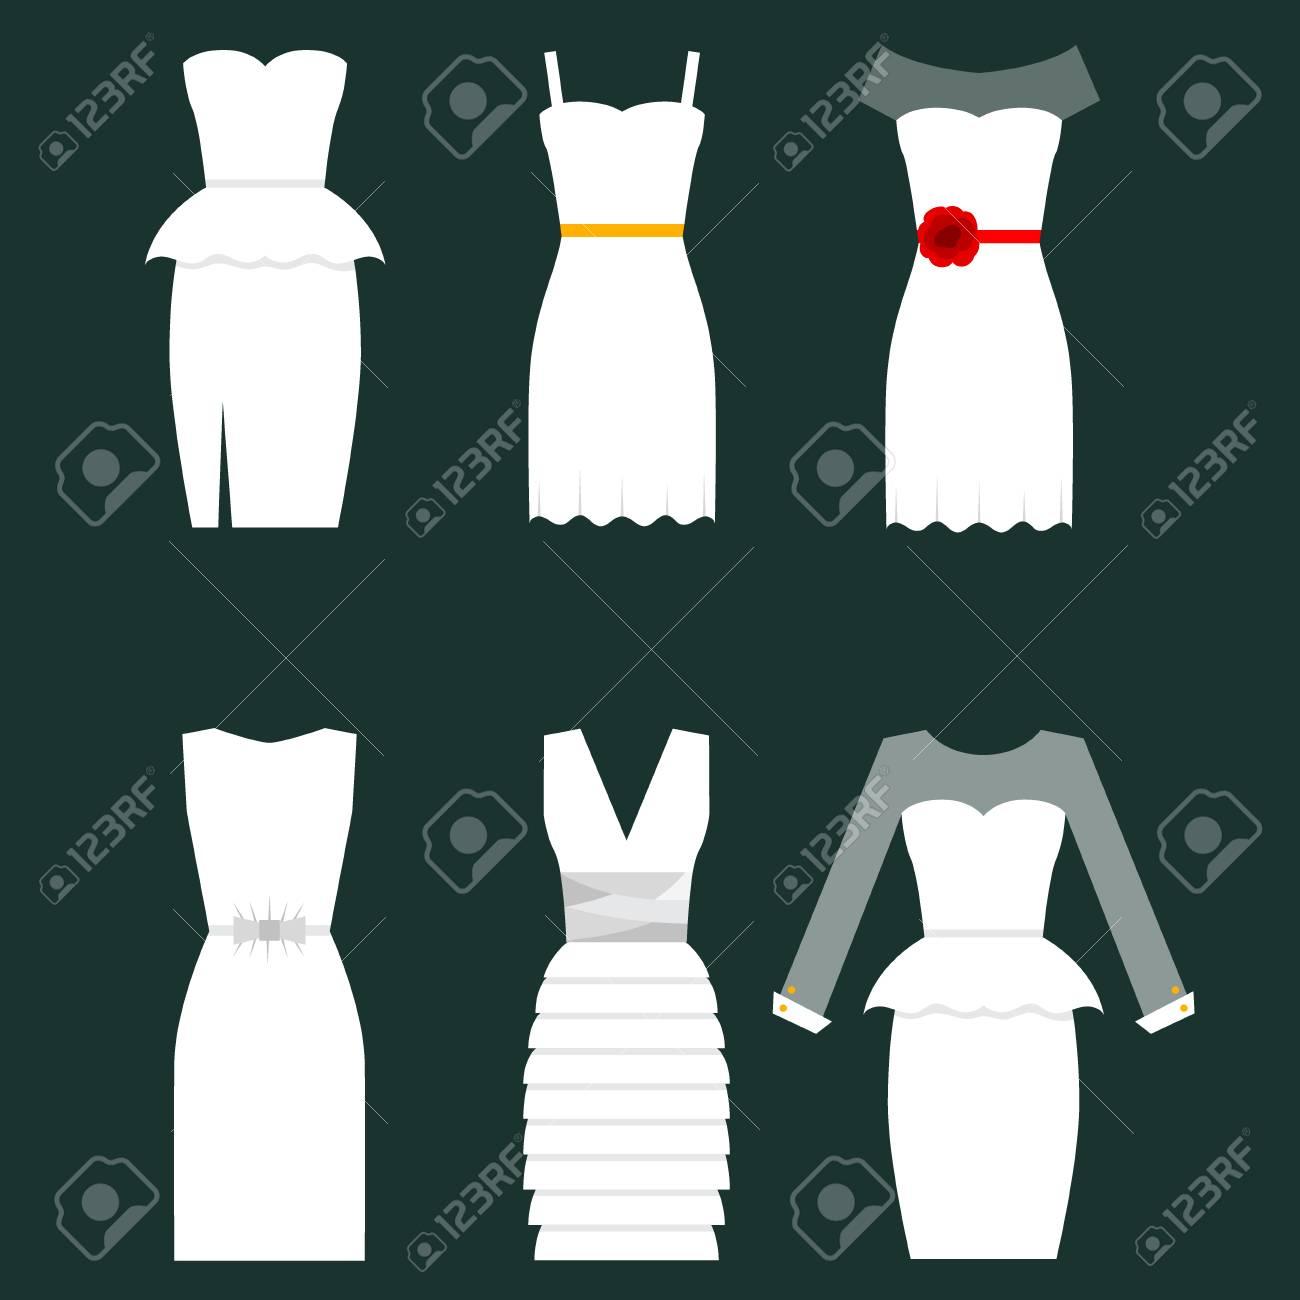 LaIllustration De Blanche Style Robe ; Mariée Composition Damp;39 Mariage Invitation JK31TlFc